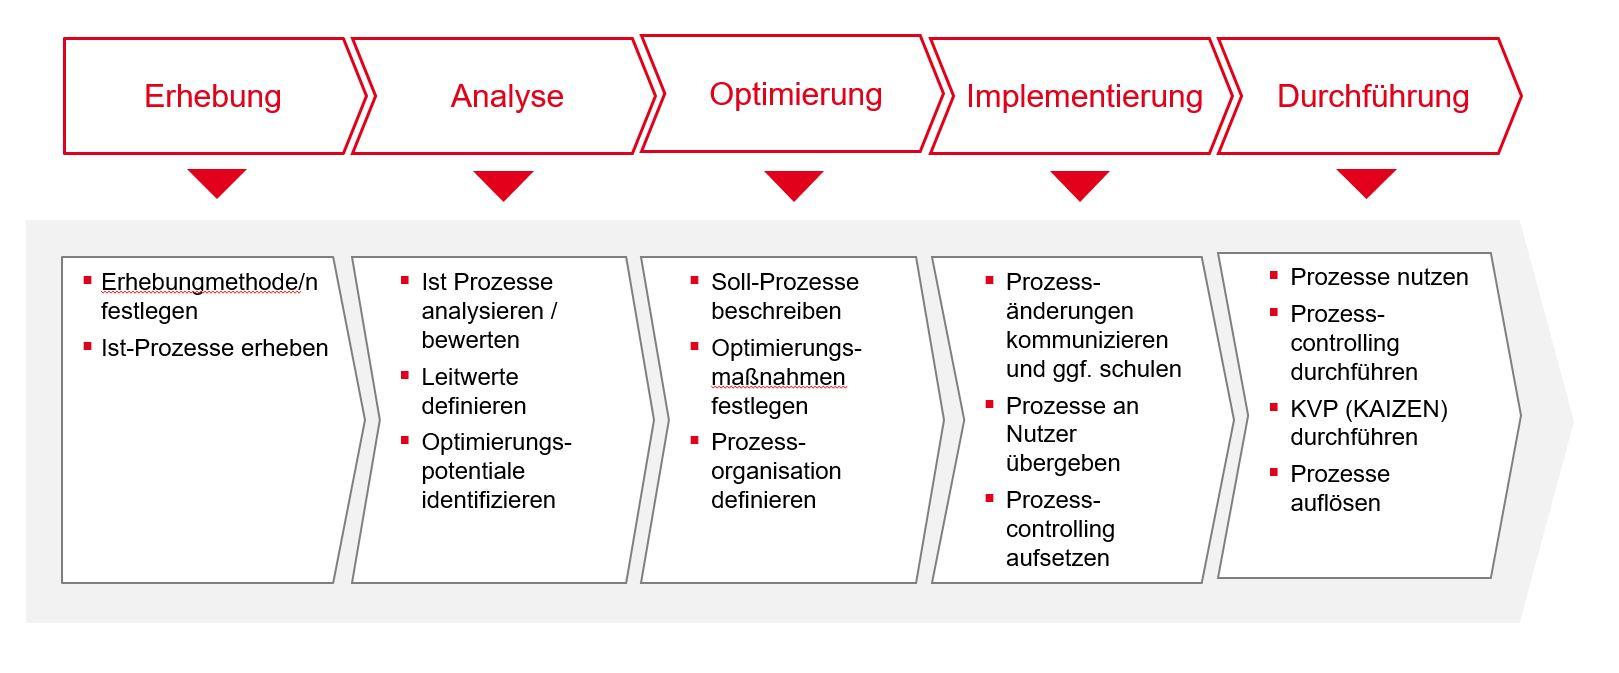 PMCC Grafik Prozesslebenszyklus